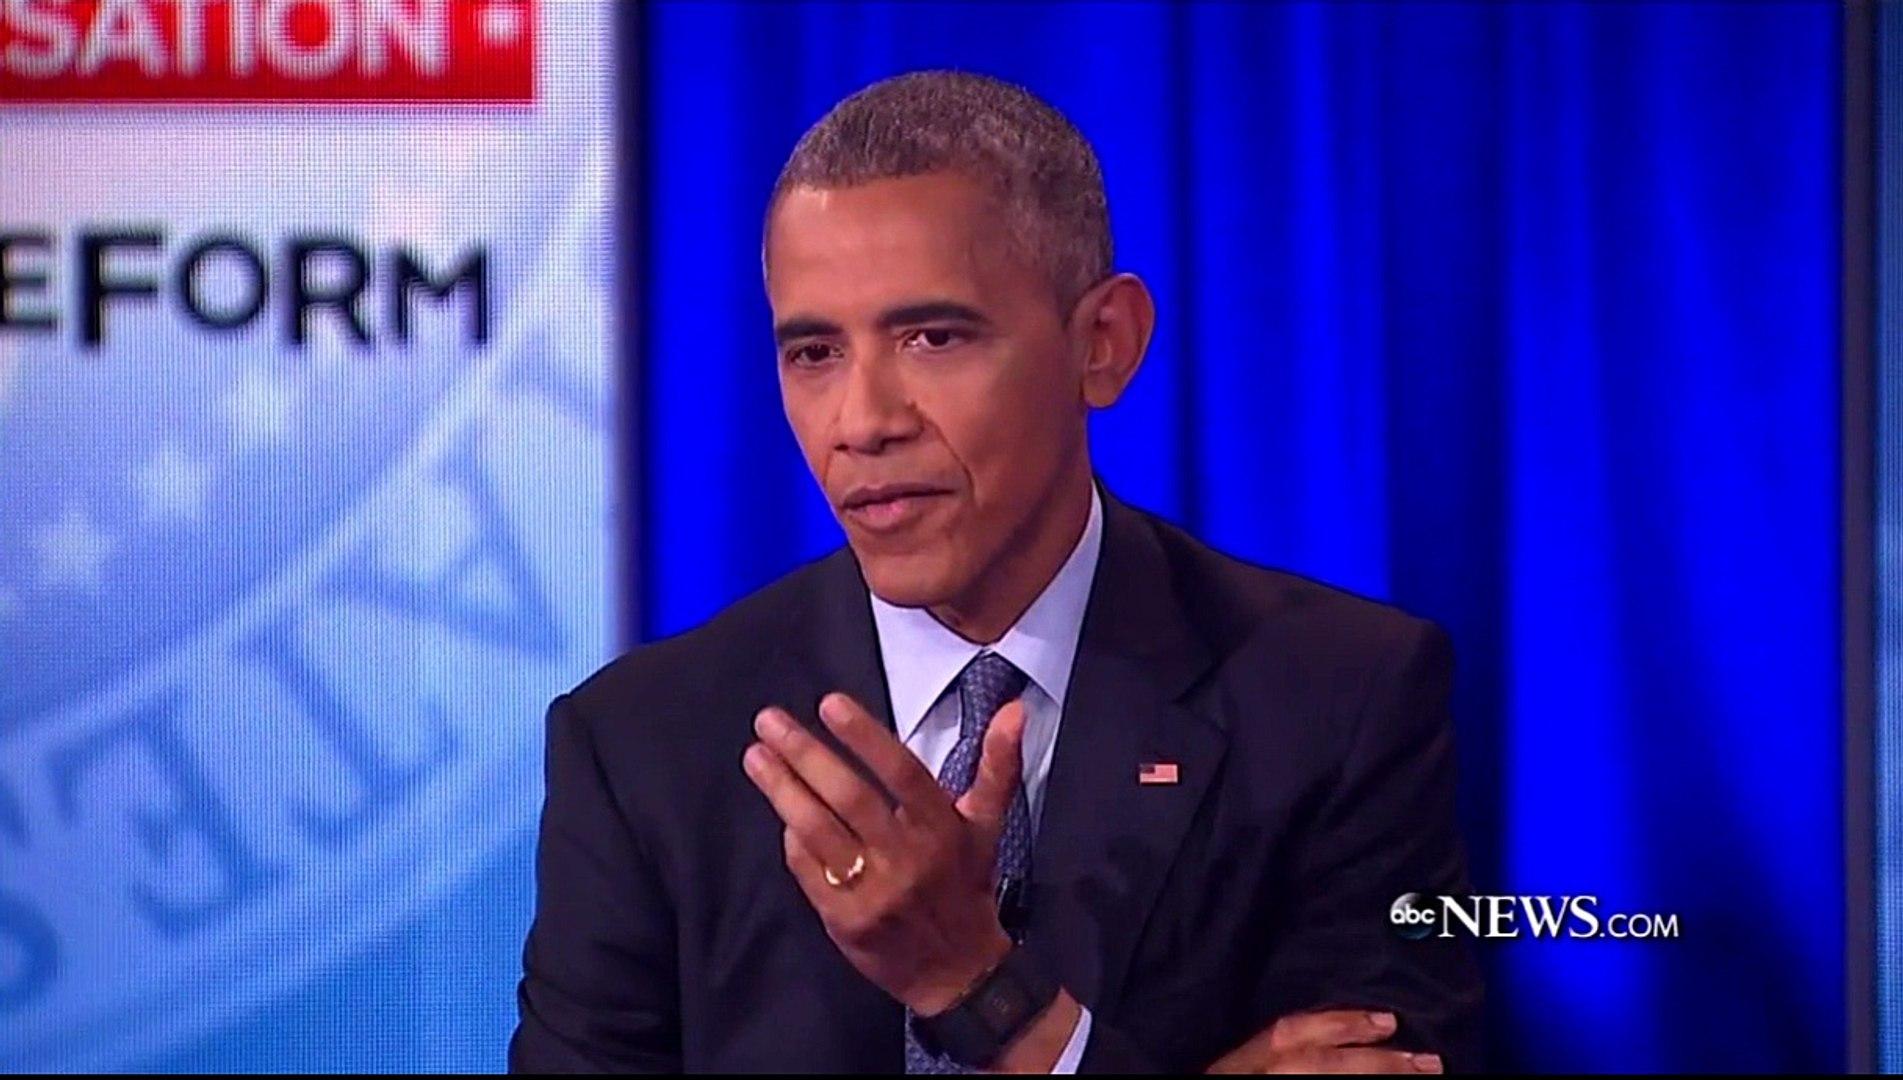 Obama Dan Patrick